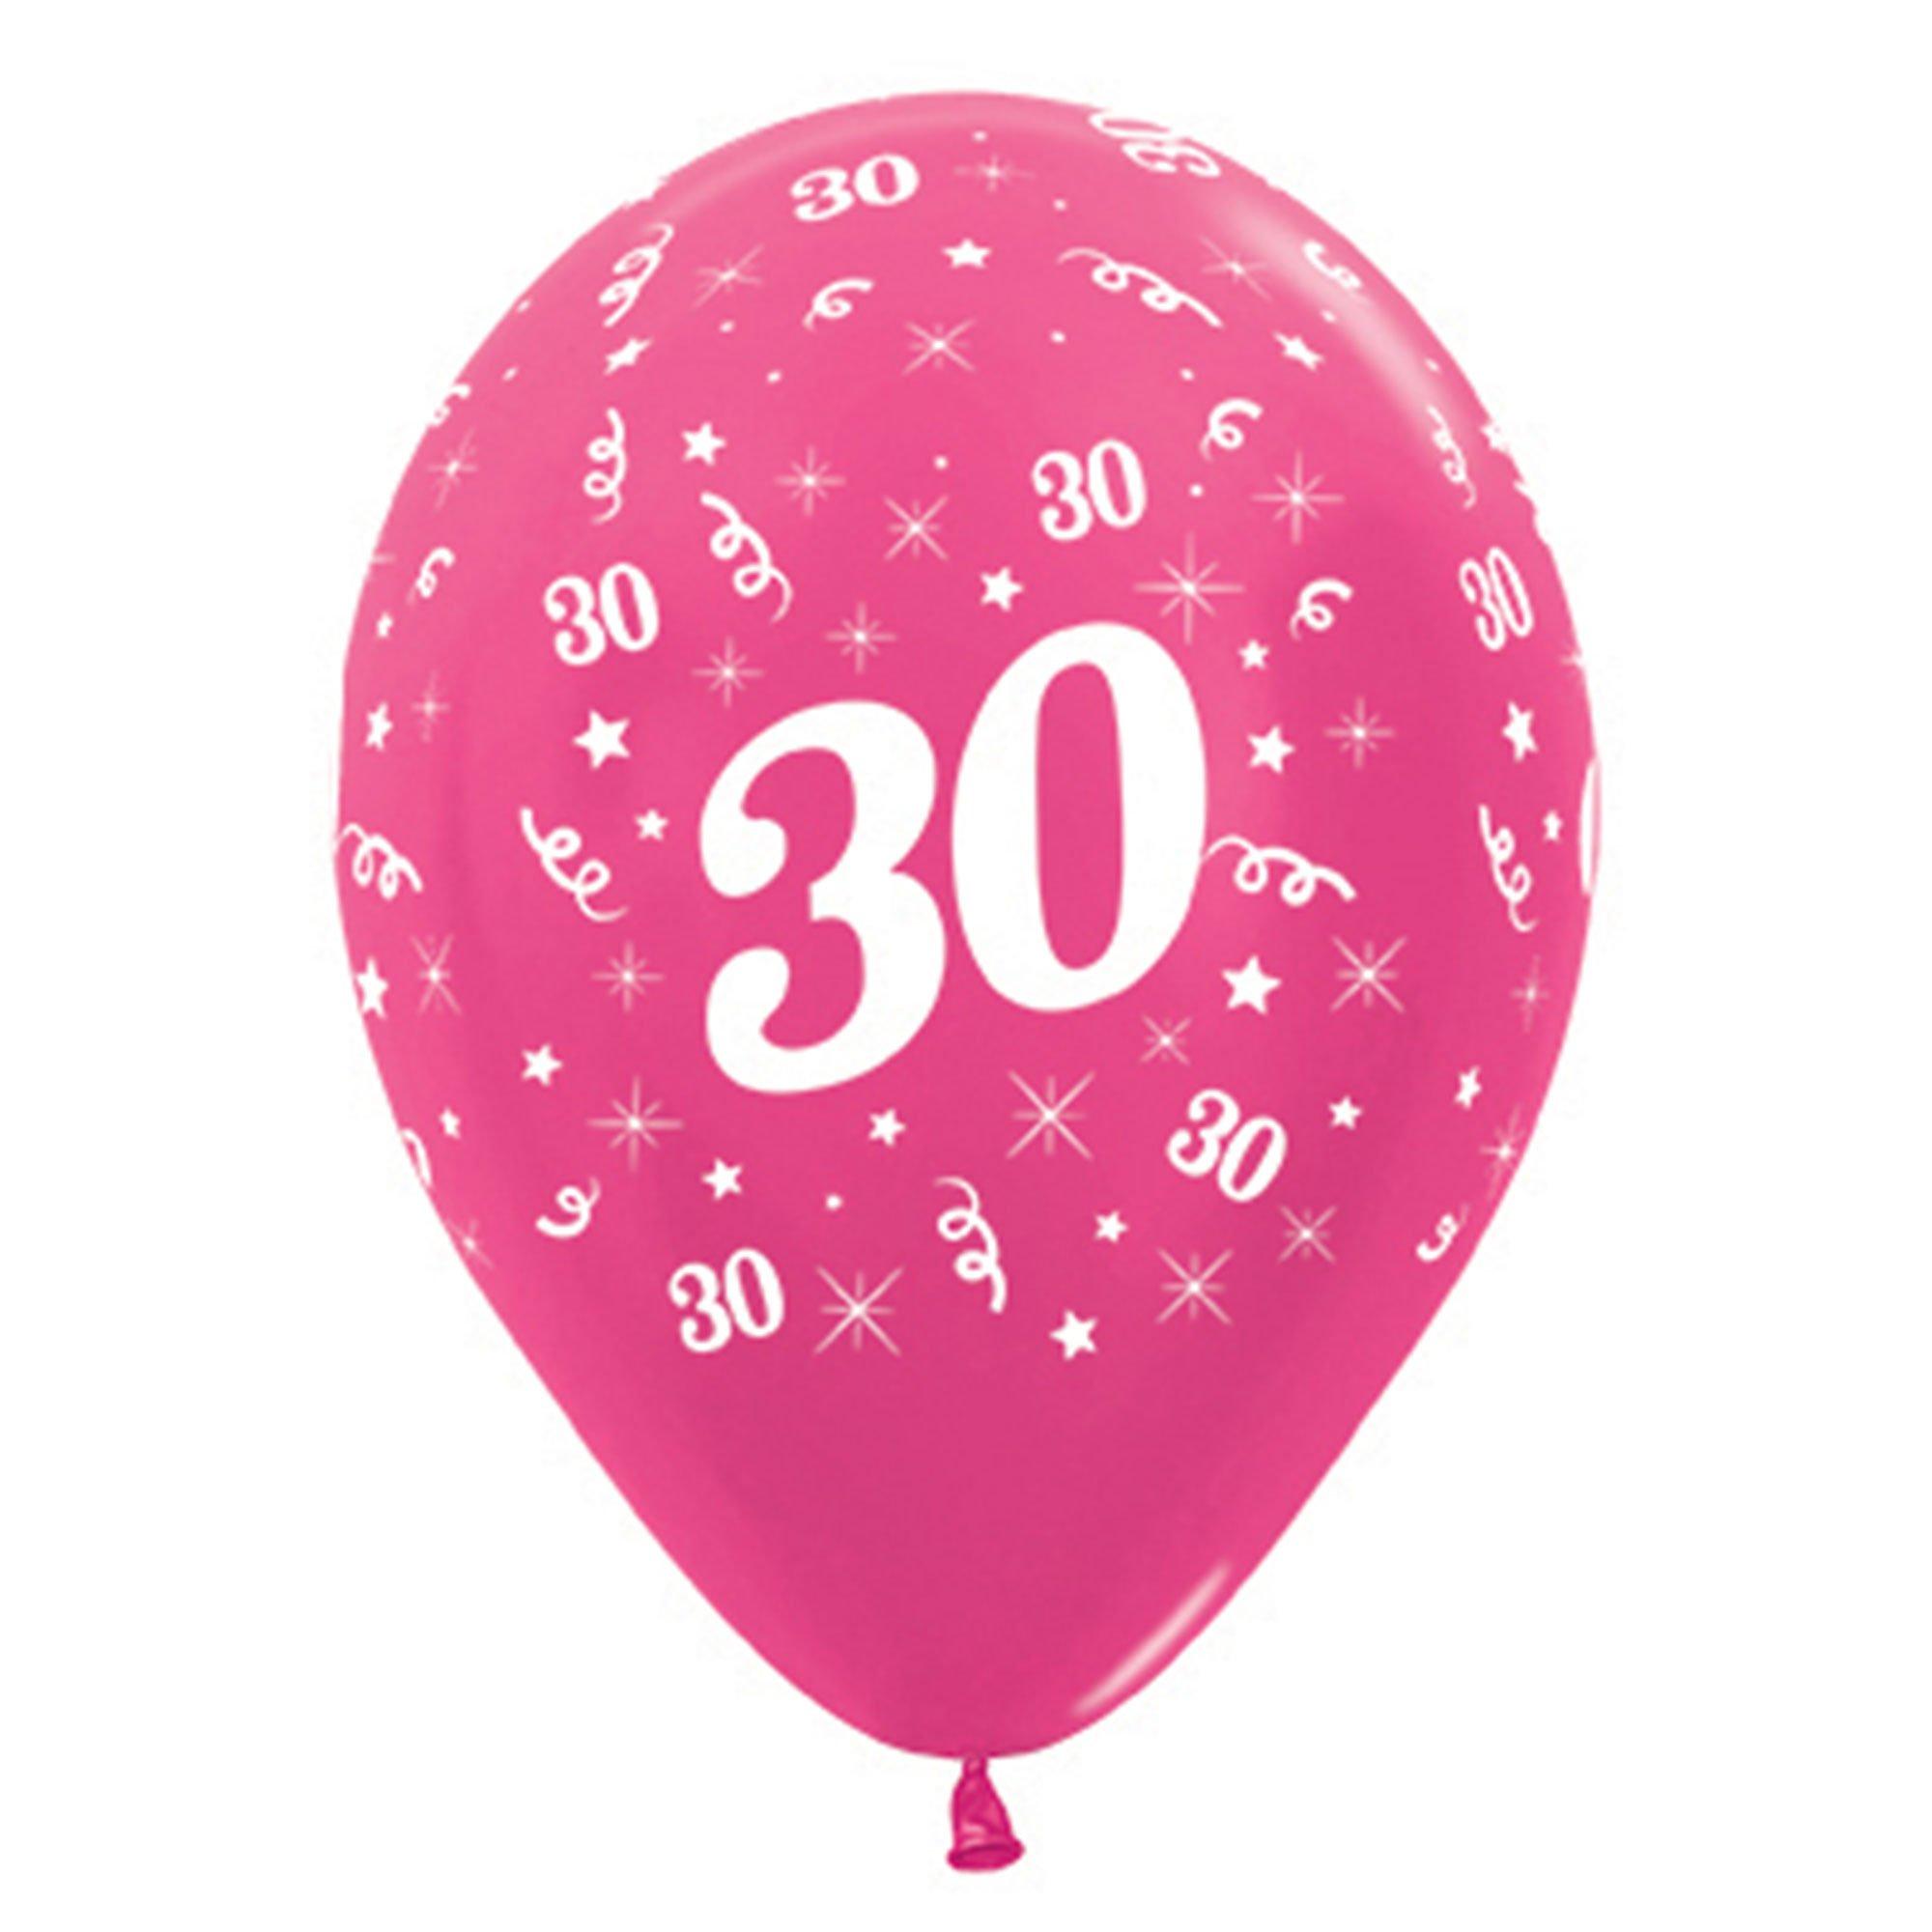 Sempertex 30cm Age 30 Metallic Fuchsia Latex Balloons, 6PK